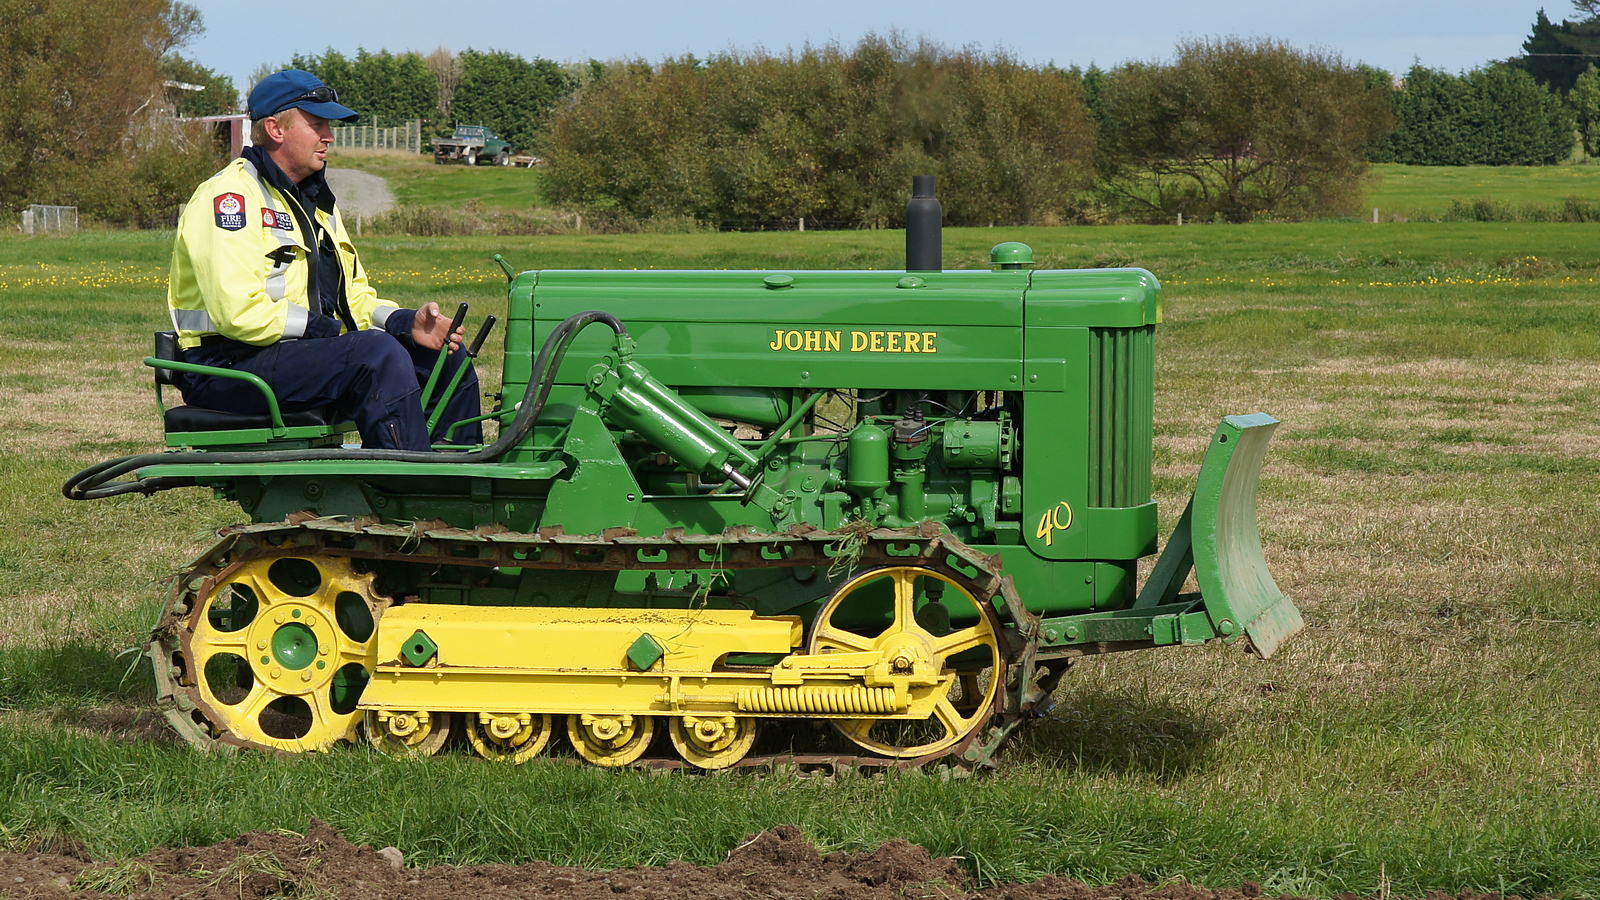 John Deere 40